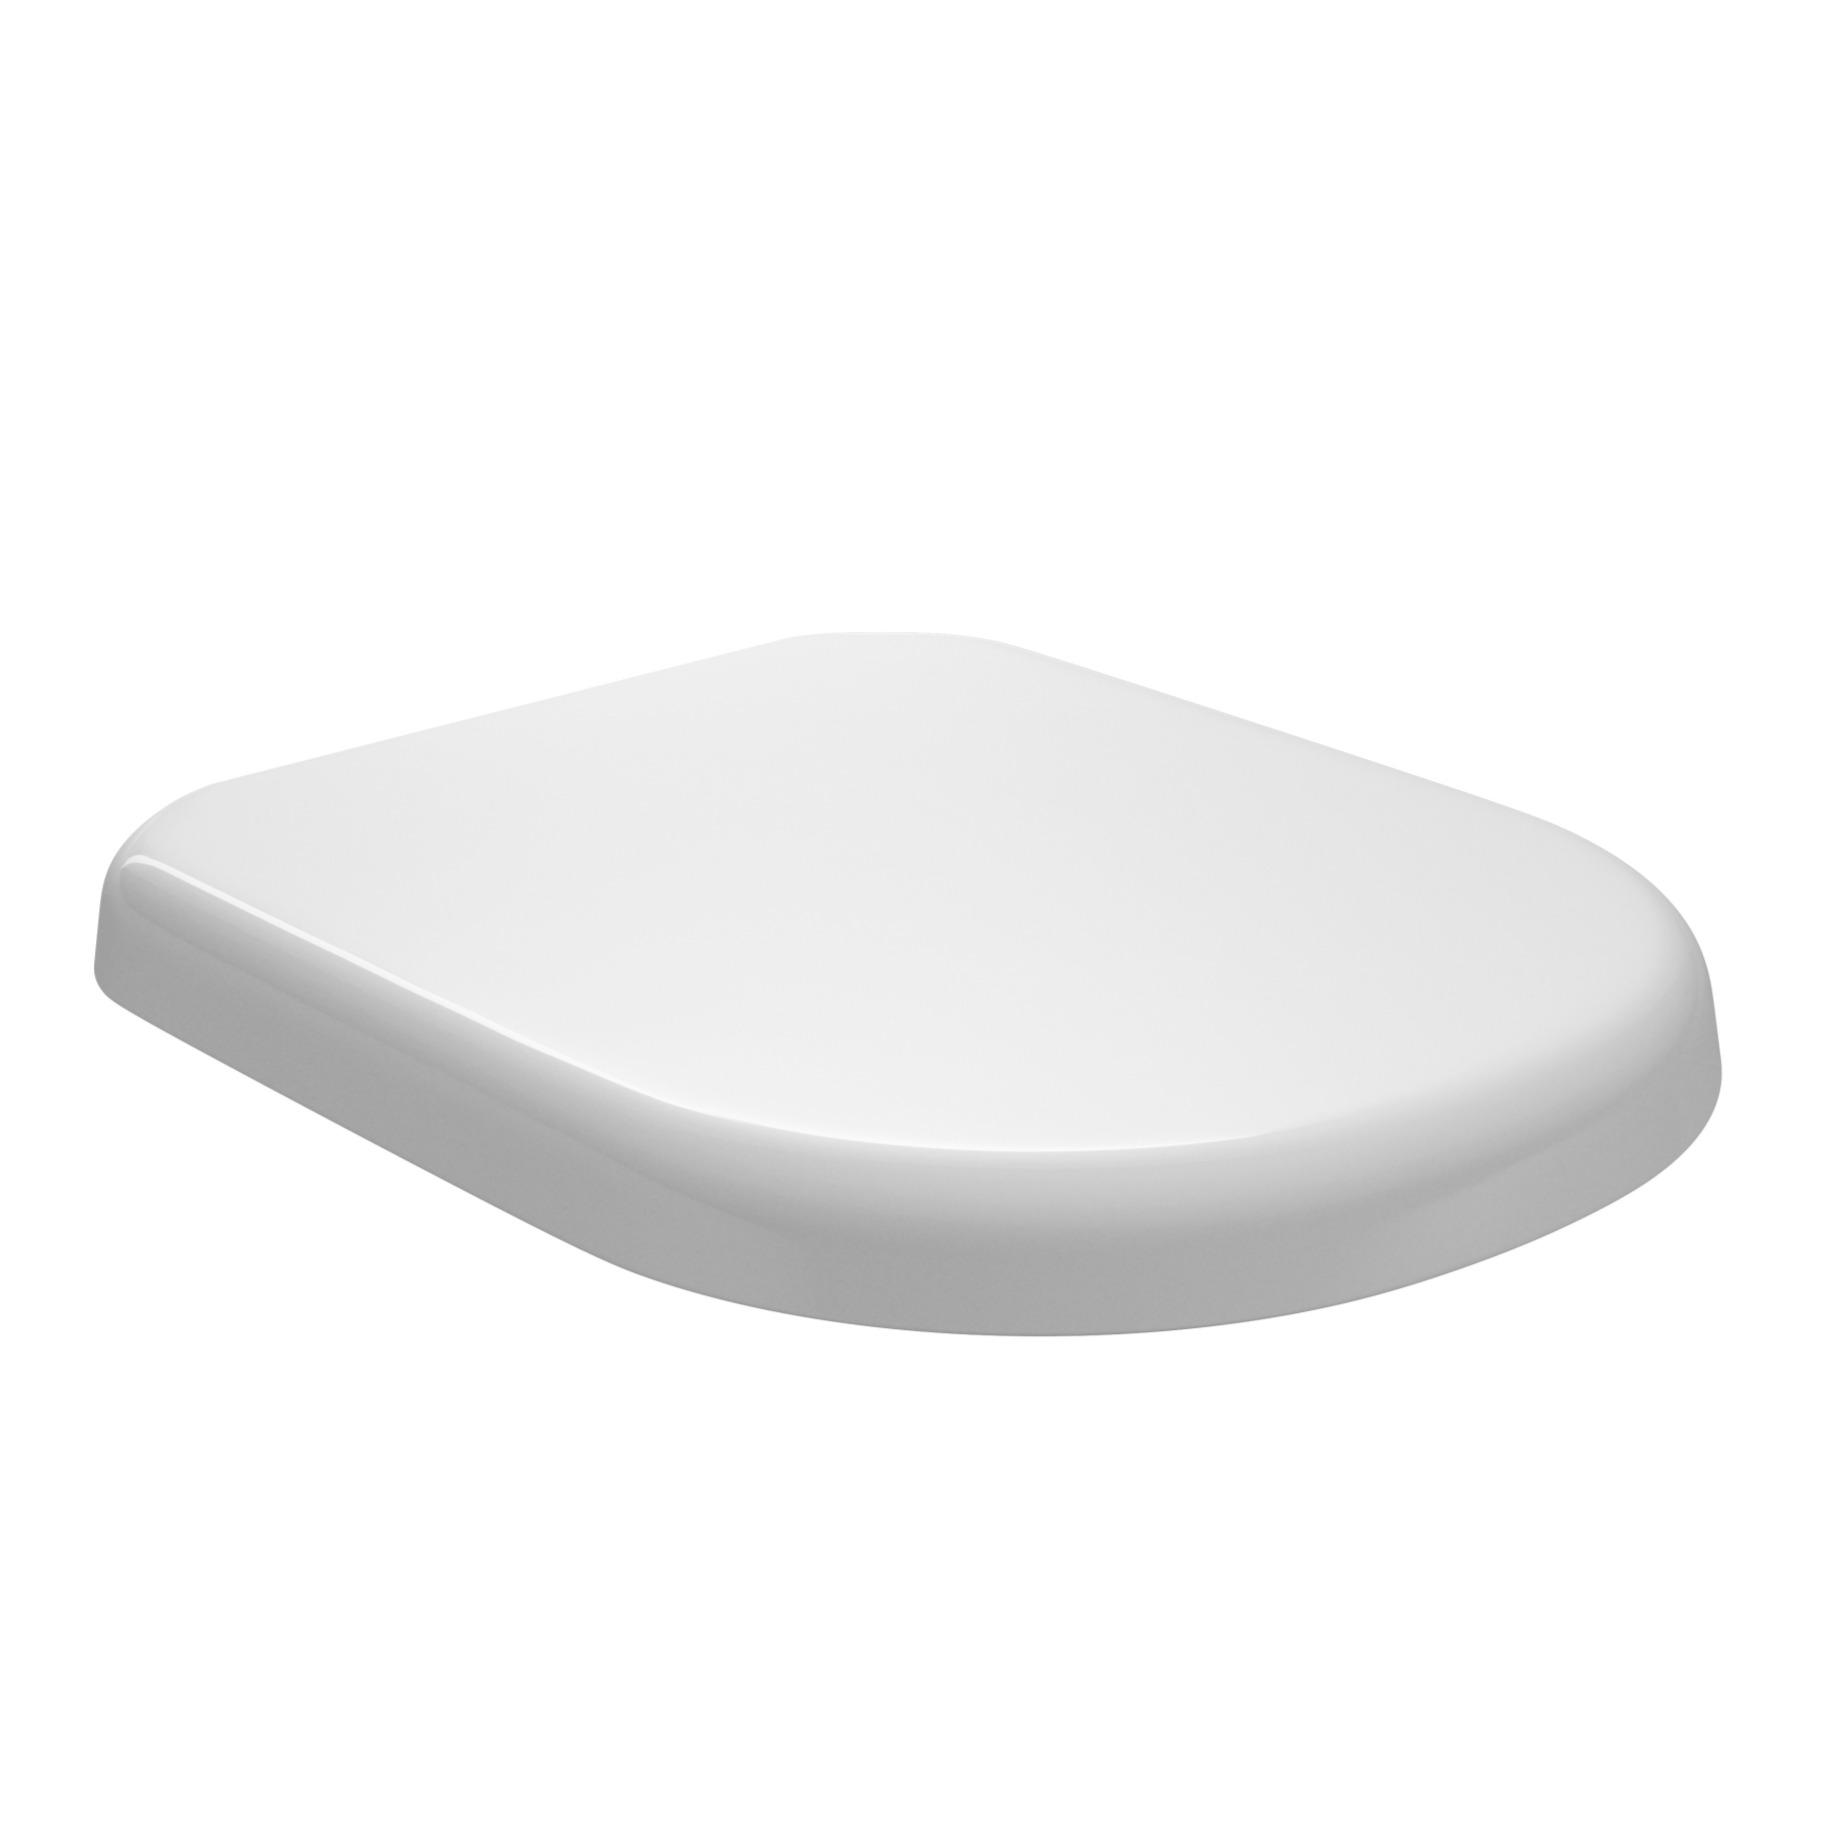 Assento Sanitario Vogue Plus G Termo Slow AP51617 Branco Gelo - Deca